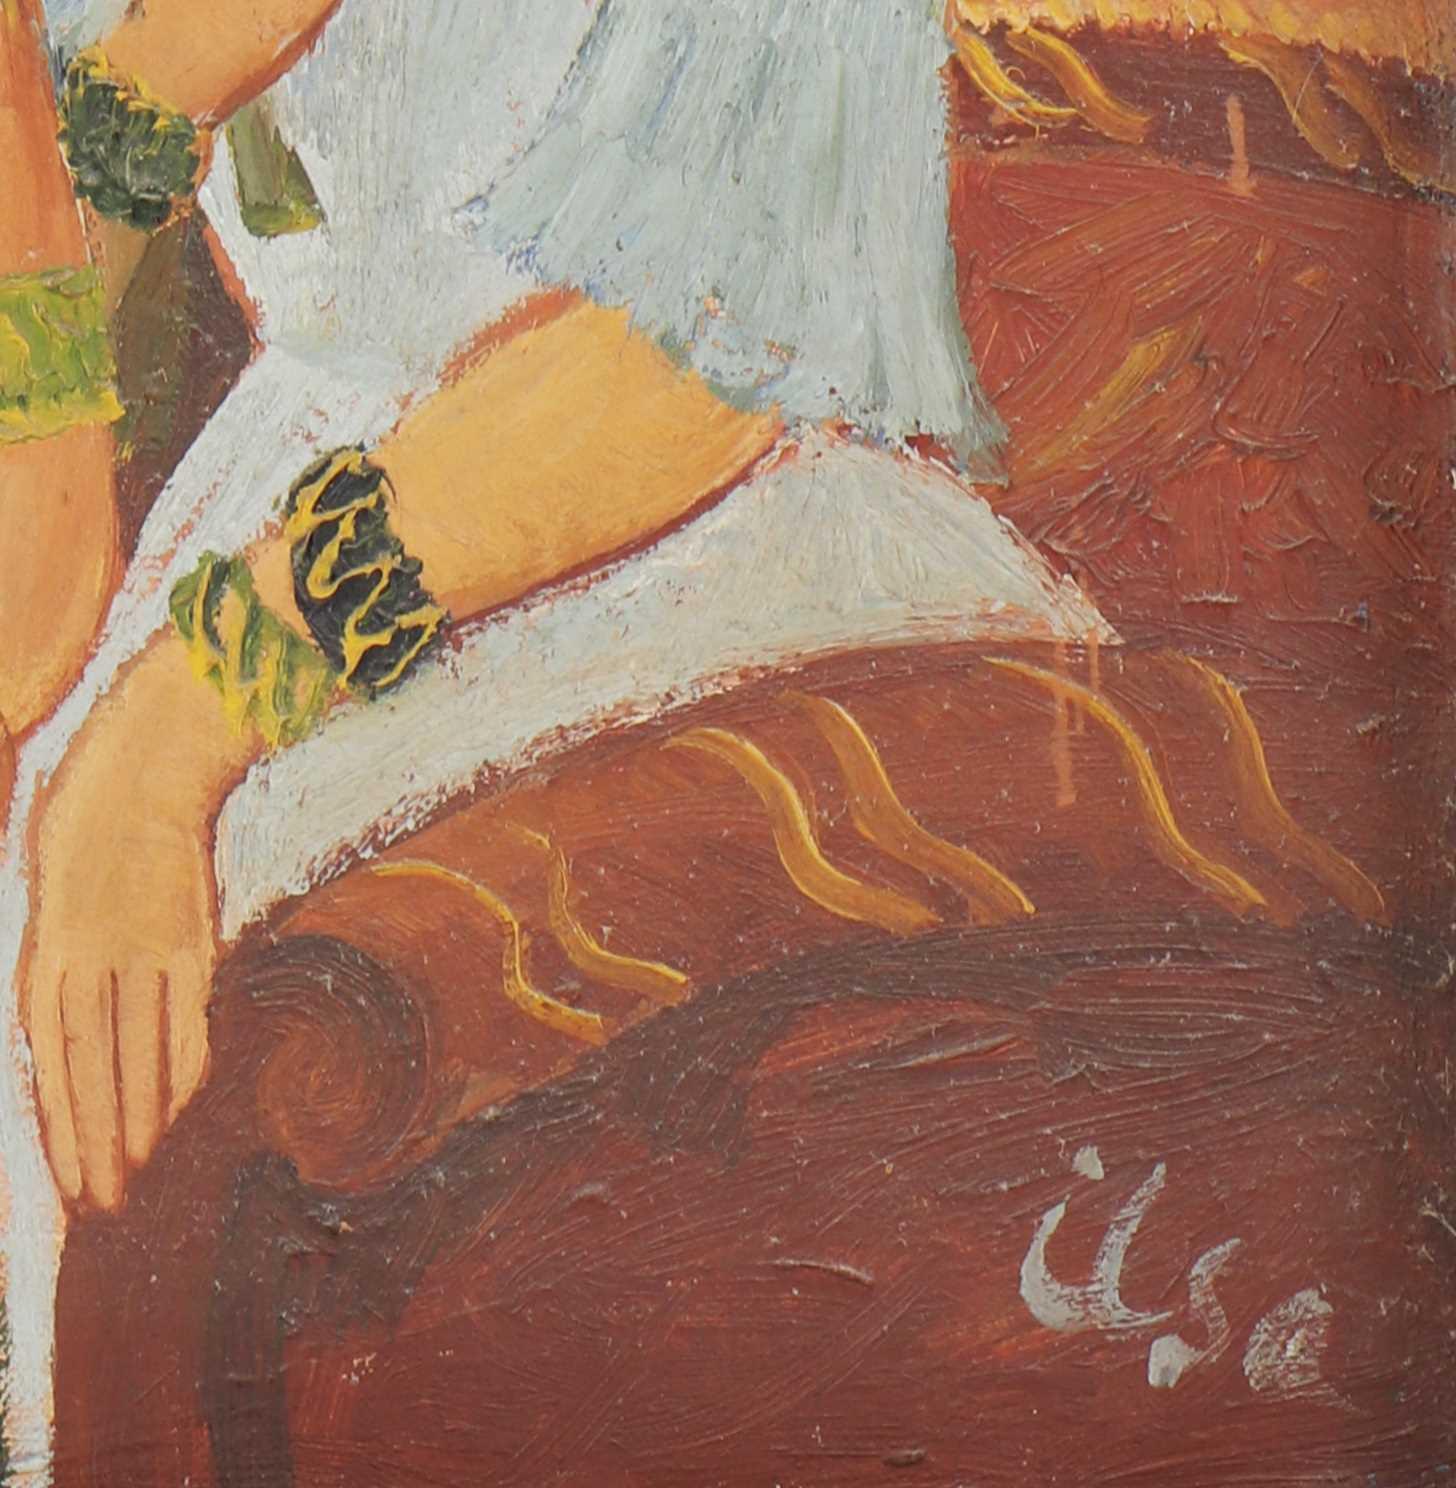 *Ilsa Rodmell (1899-1972) - Image 3 of 4